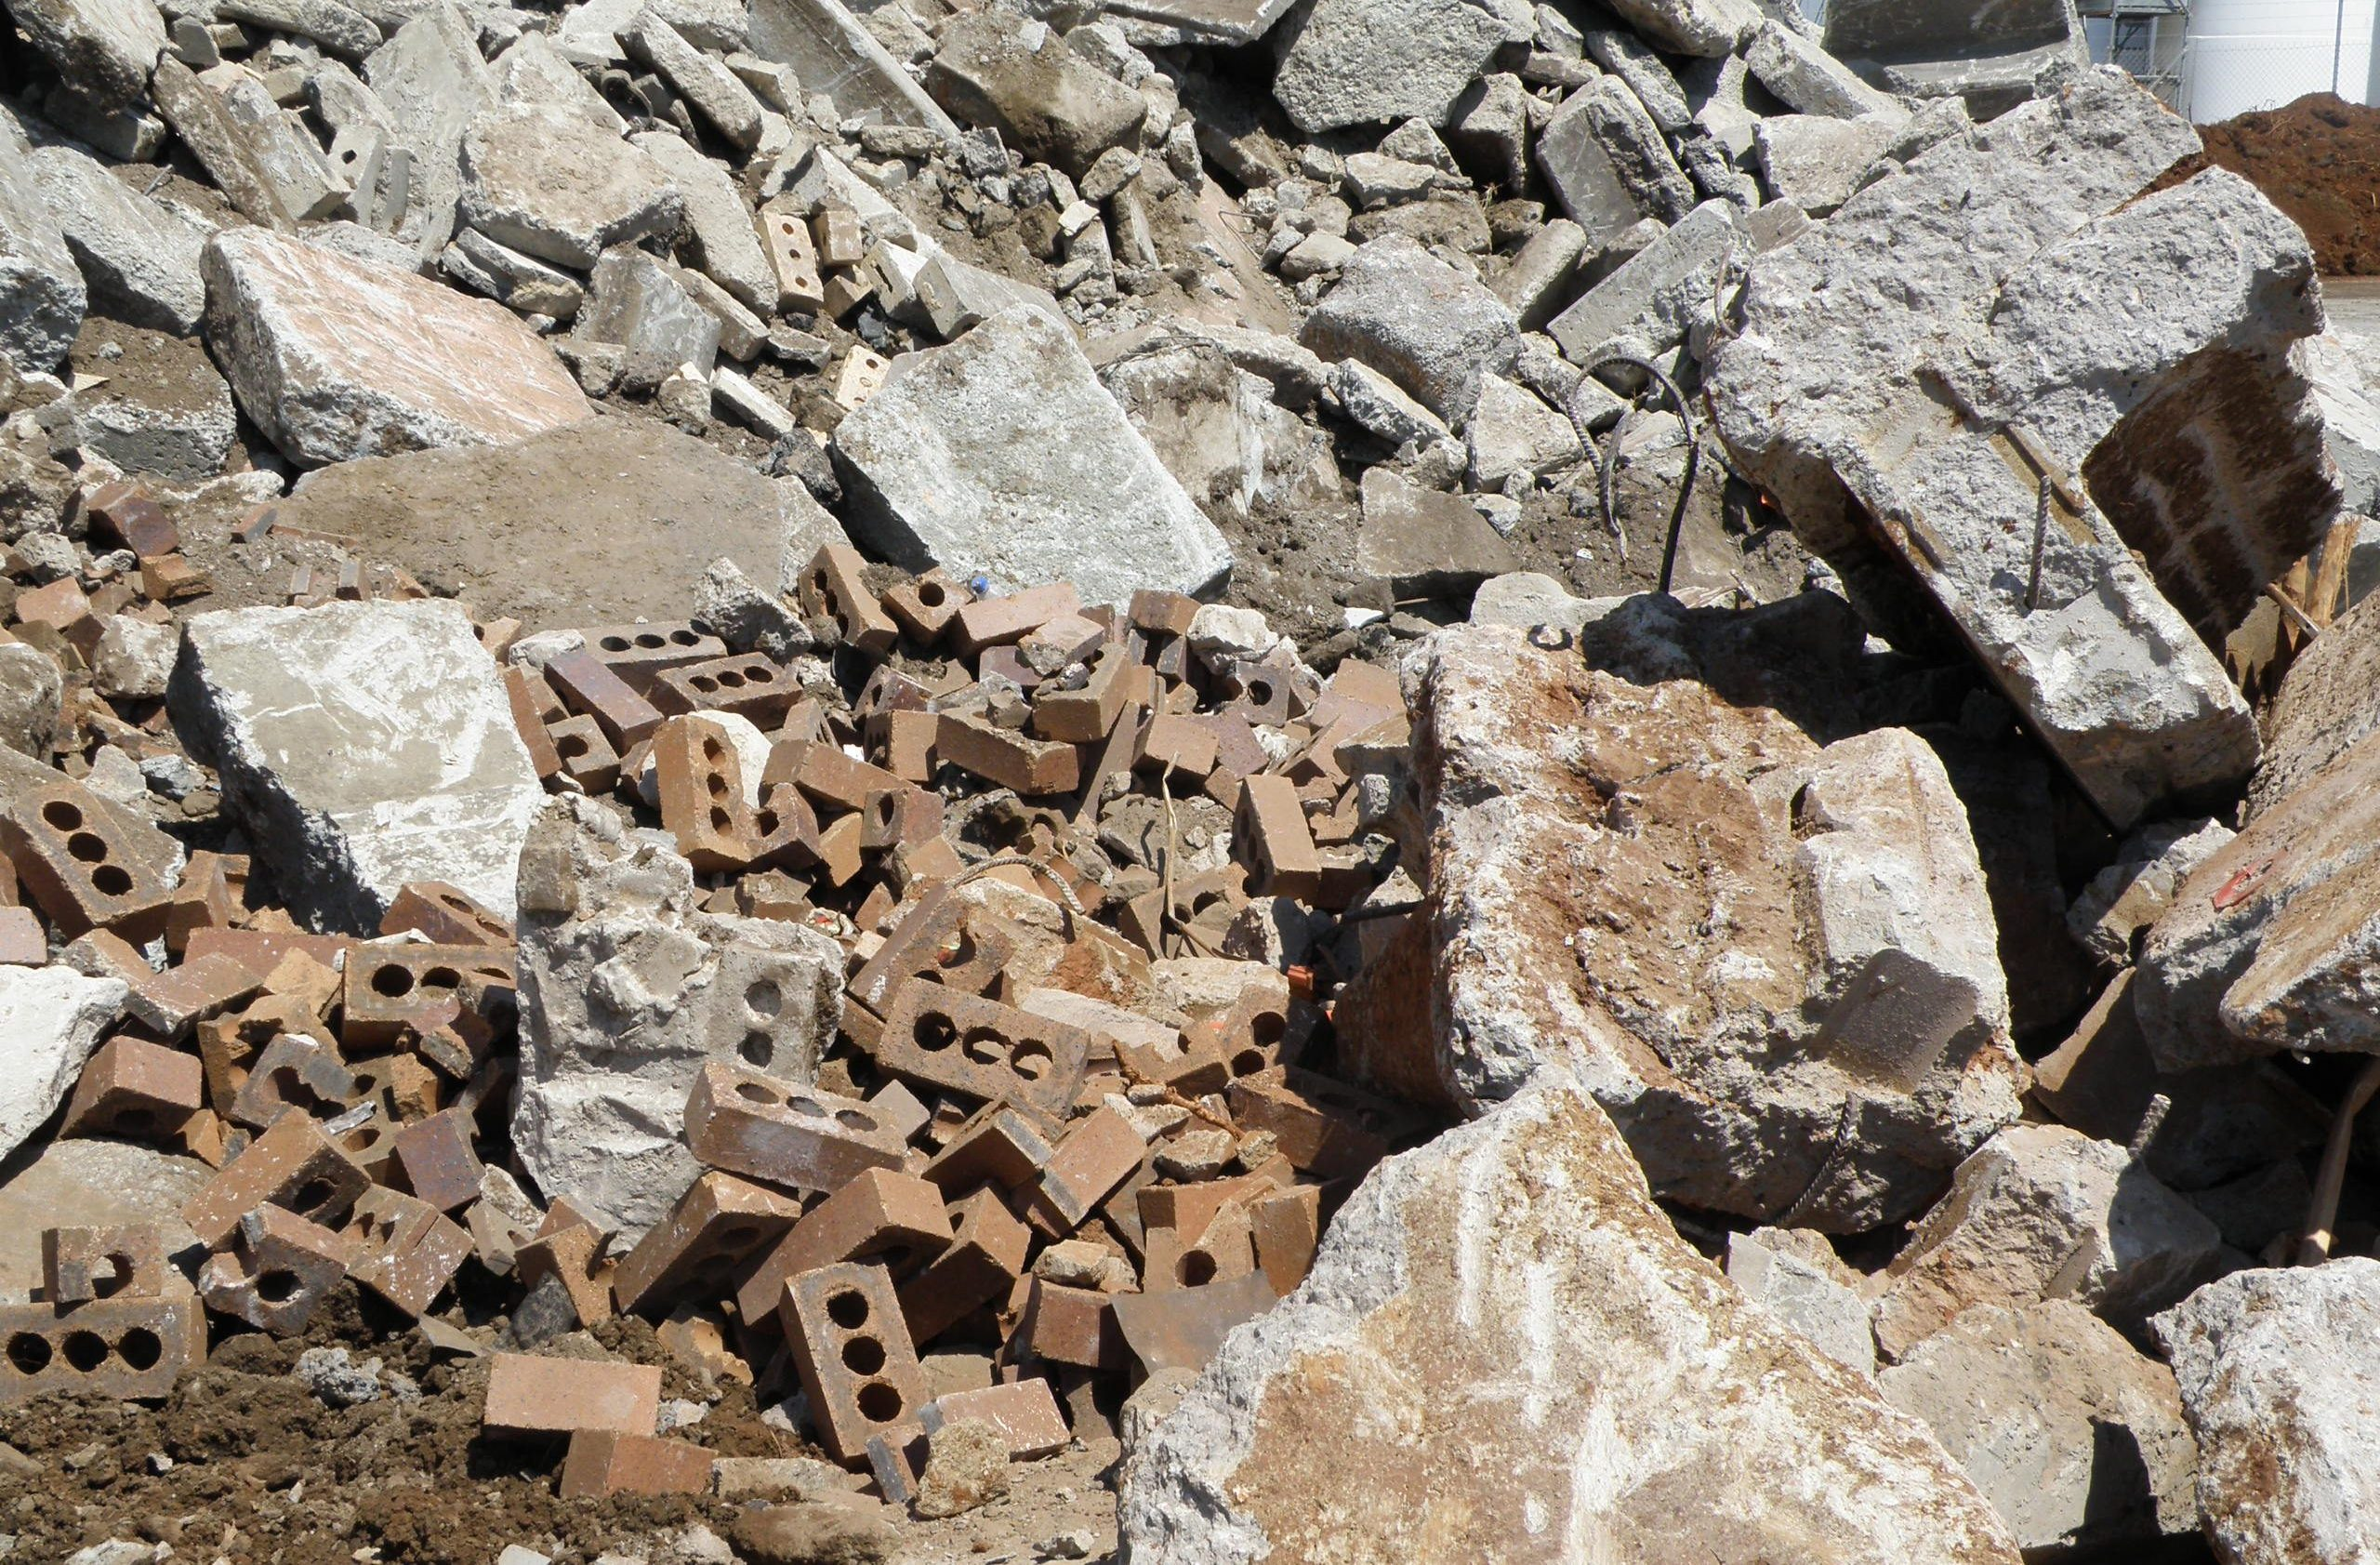 Pile of brick waste